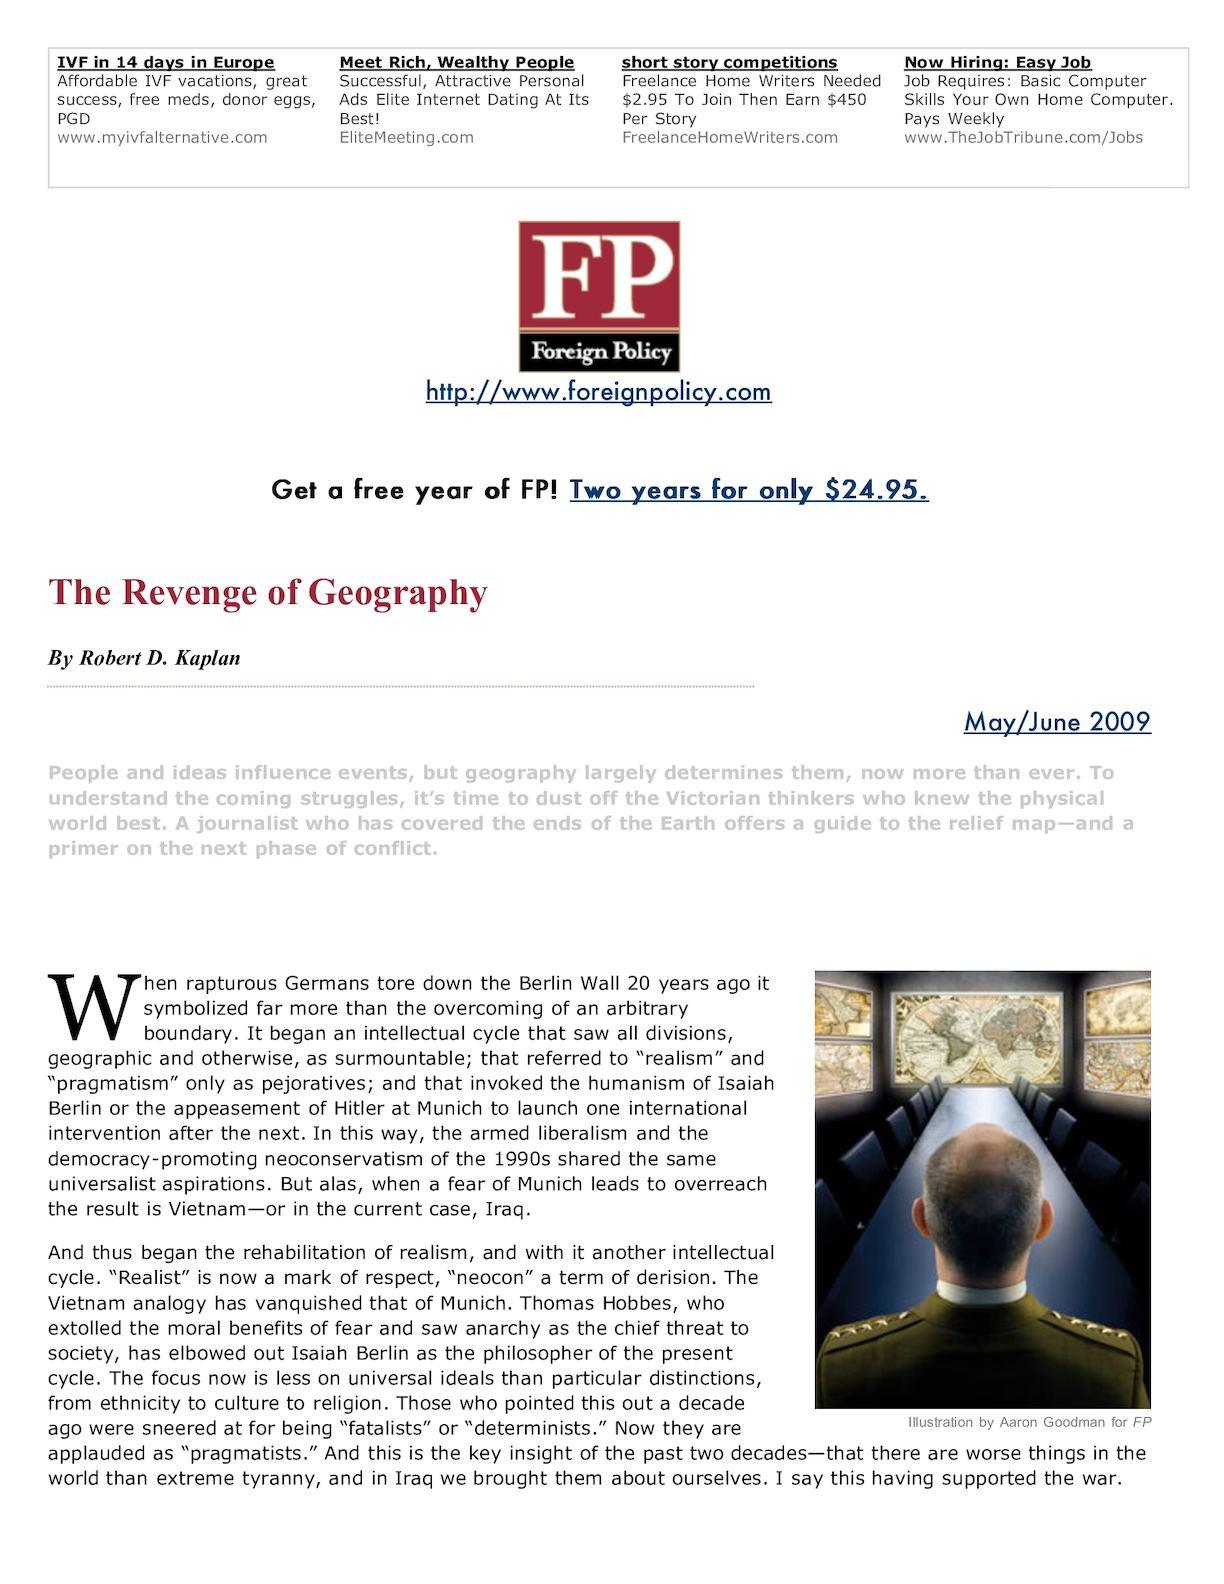 Calaméo - Kaplan 2009 Revenge Of Geography